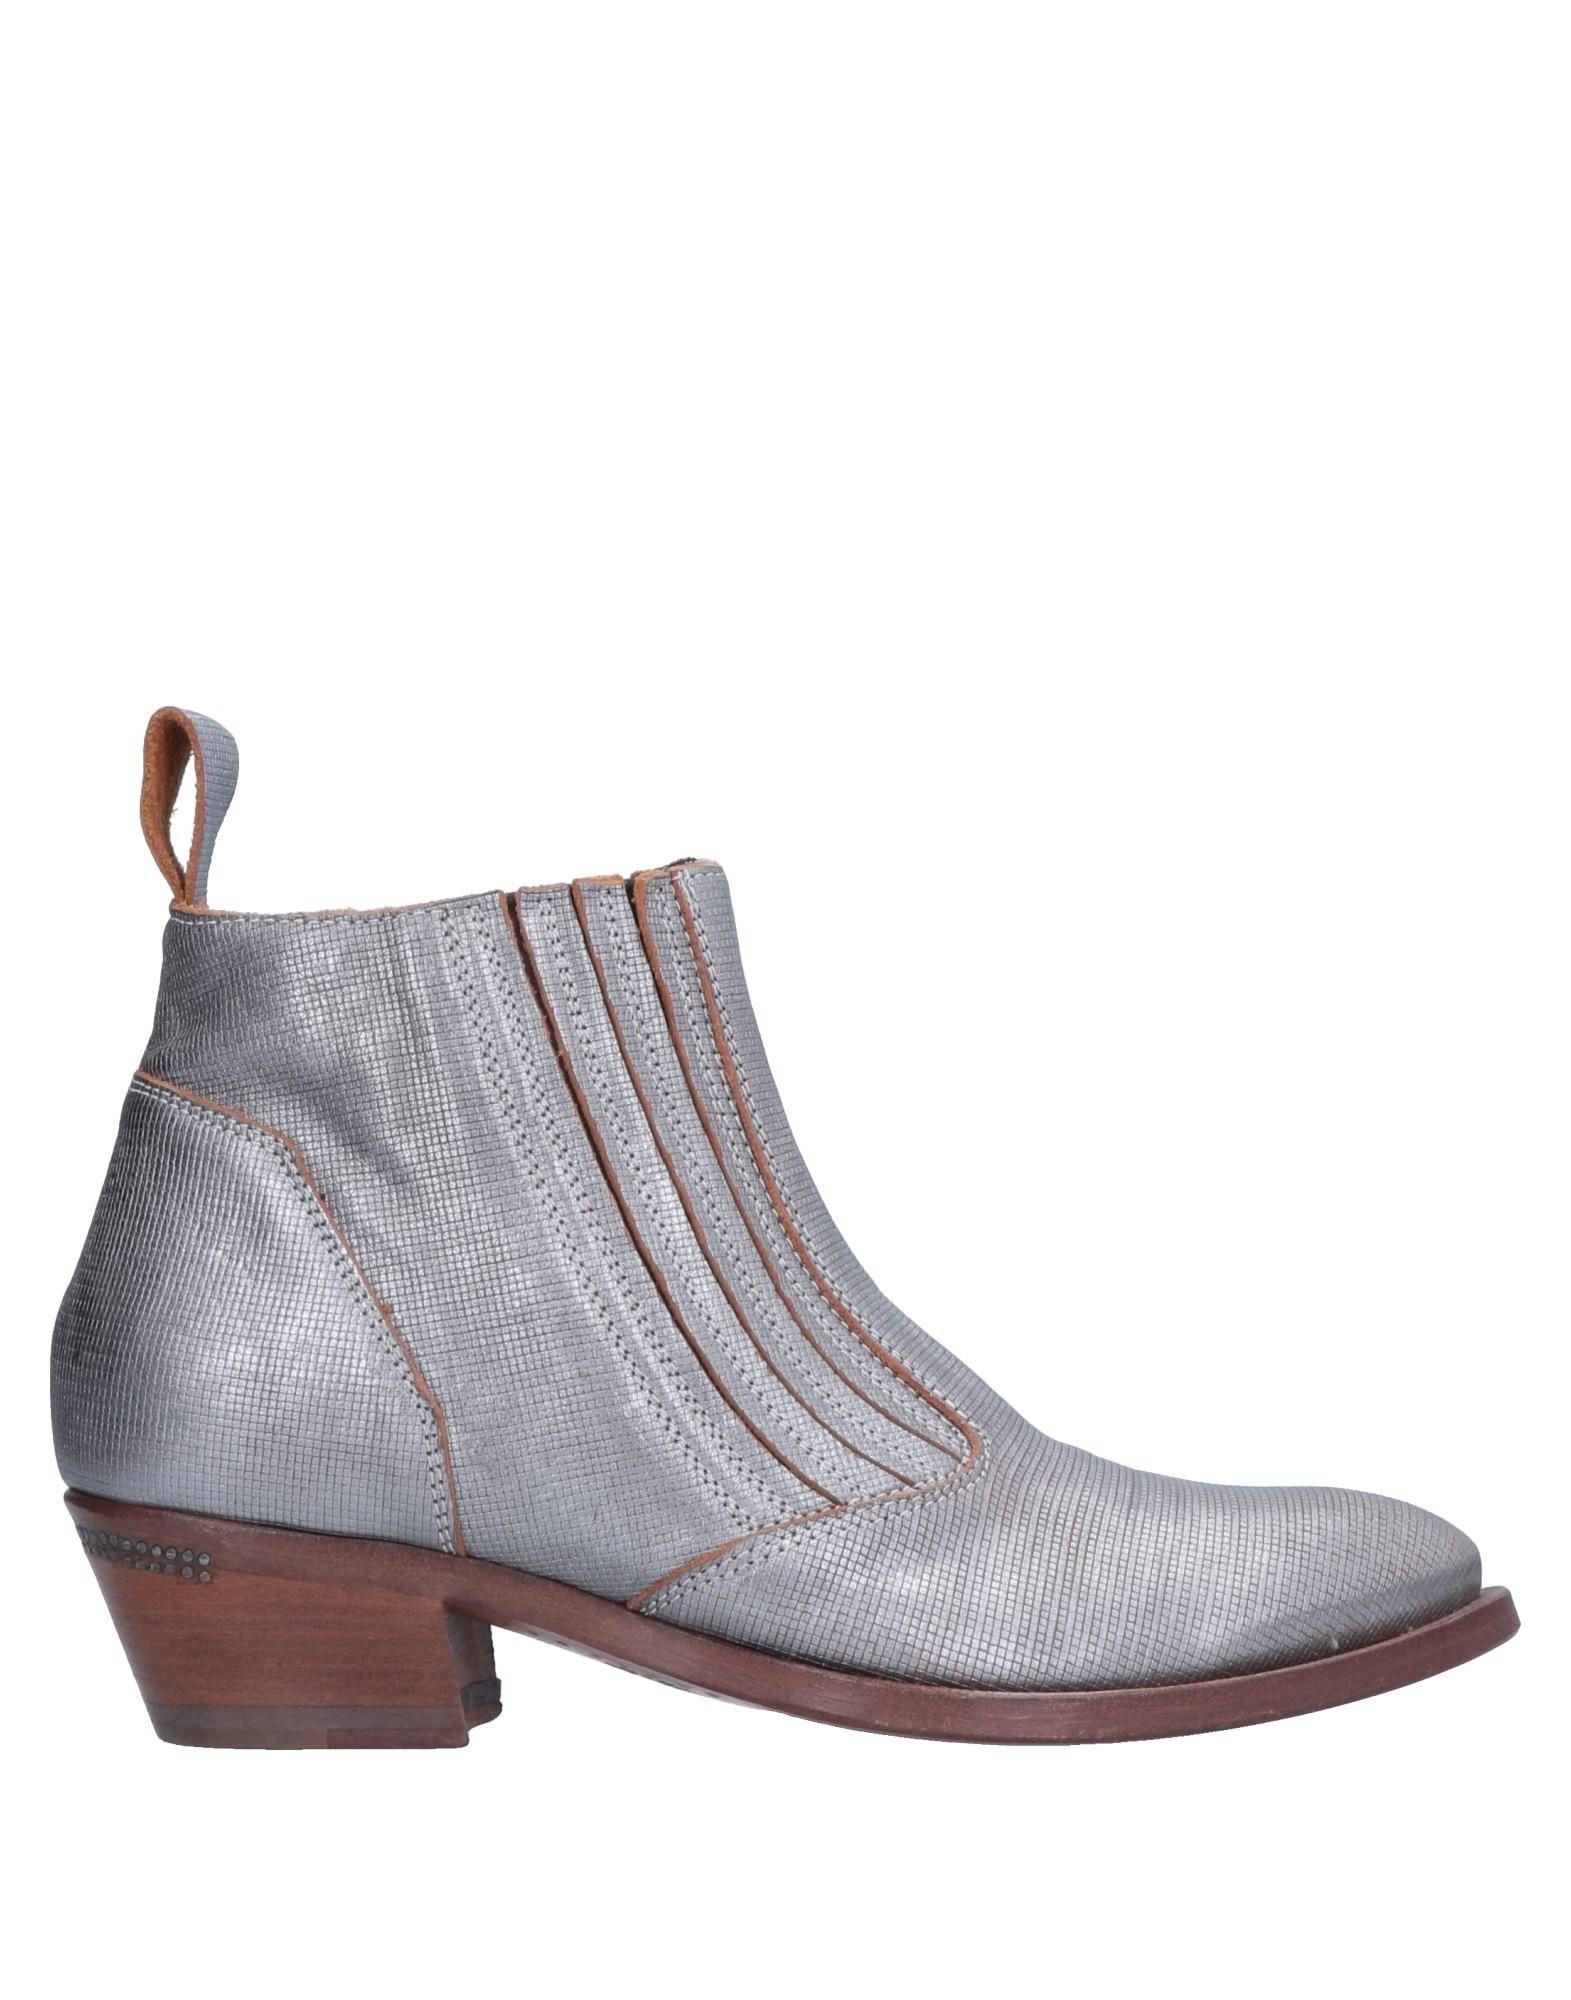 Bottillons Buttero® Femme - Bottillons Buttero® Argent Chaussures casual sauvages